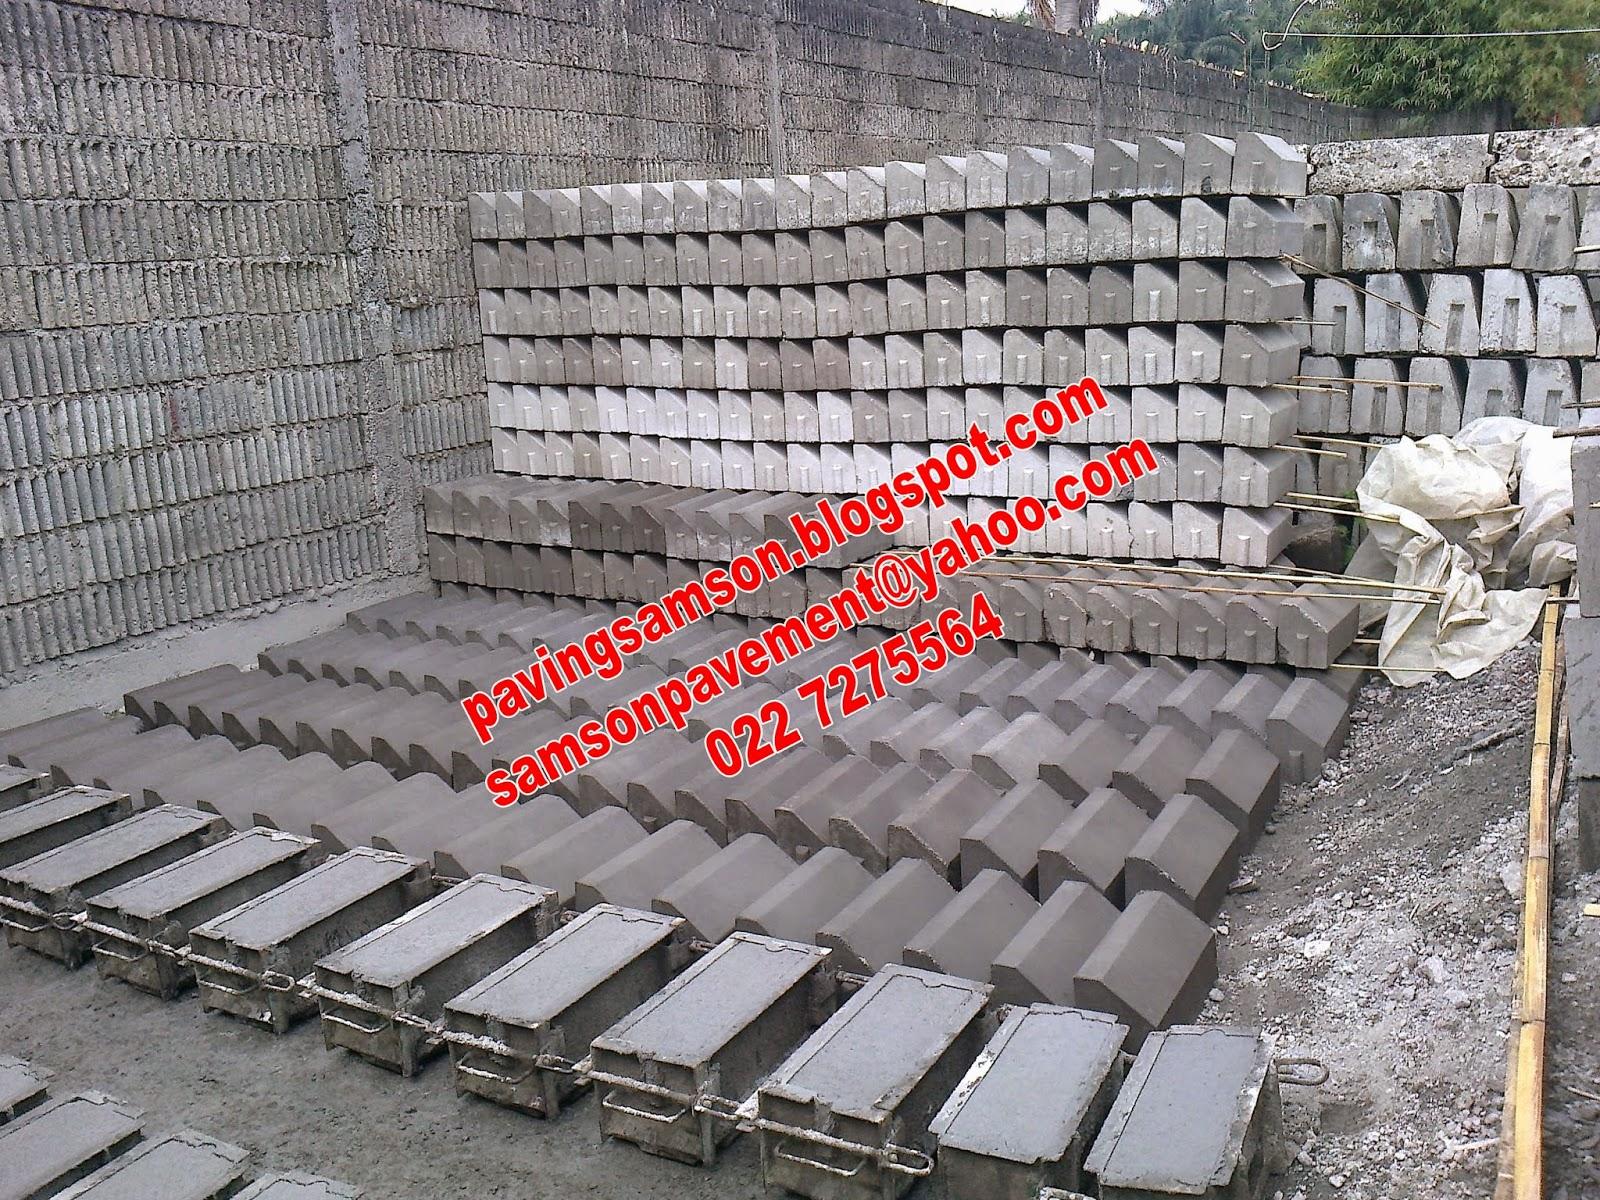 Jual Kanstin Bandung ~ Jual Paving Block Bandung